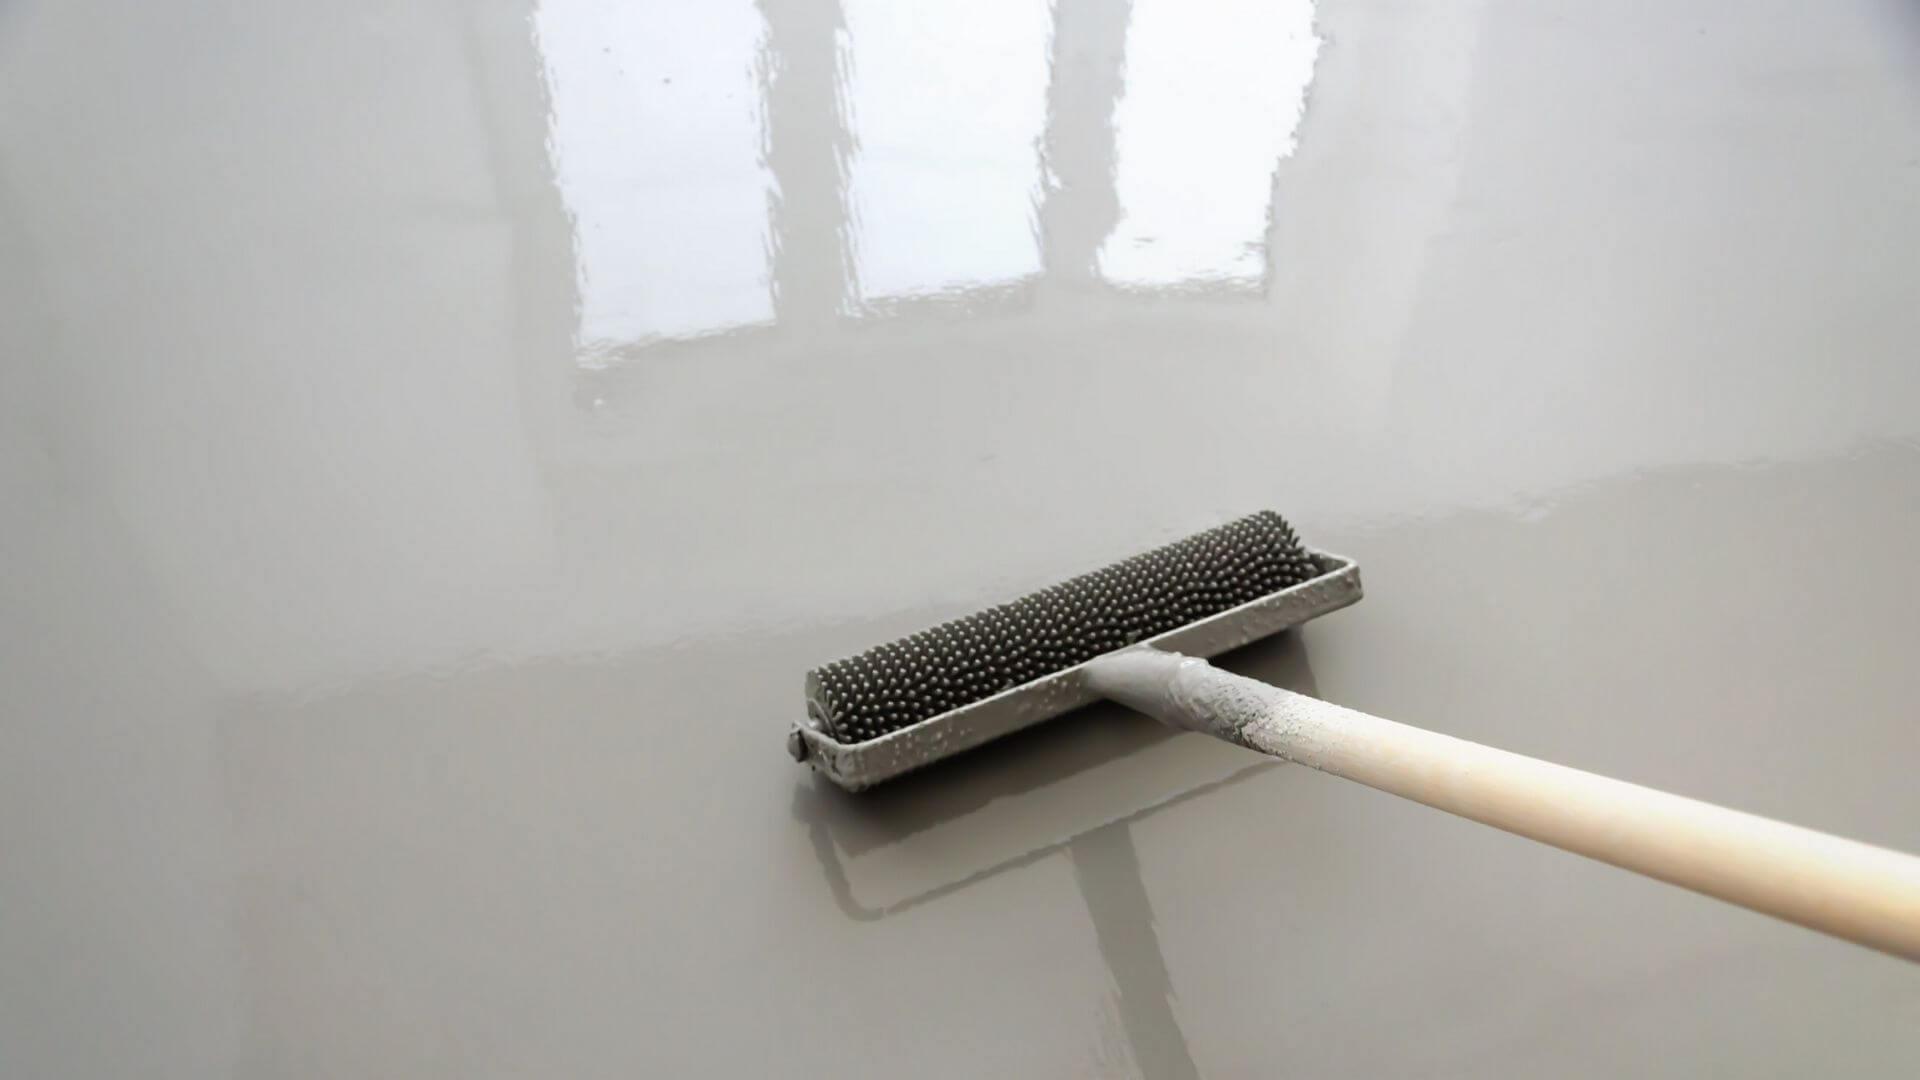 Smoothing Concrete For Epoxy Floor